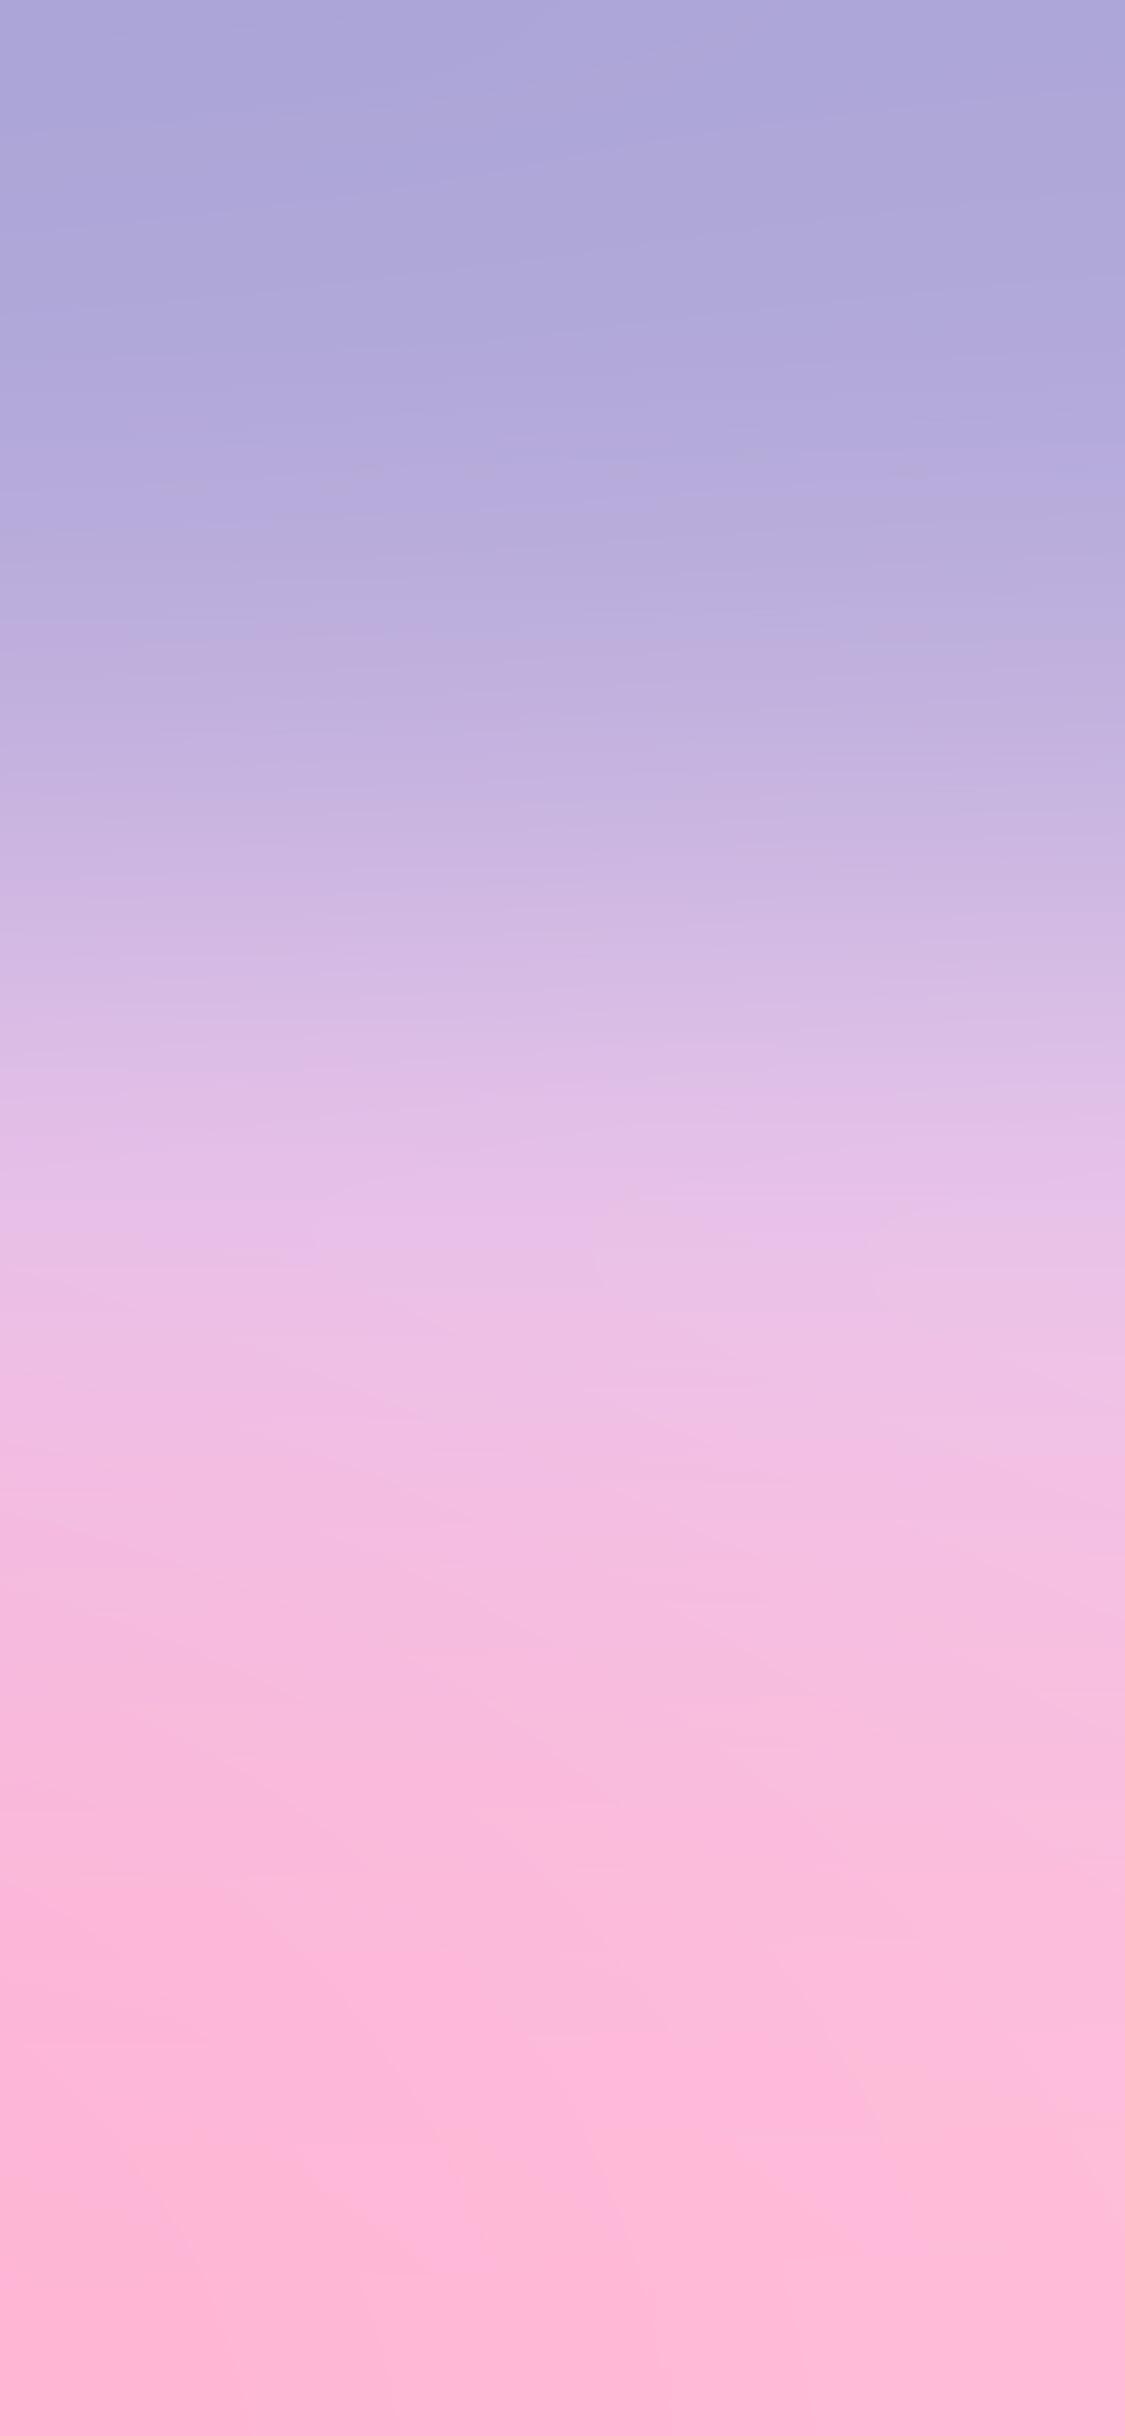 so20 blur gradation pink purple pastel wallpaper